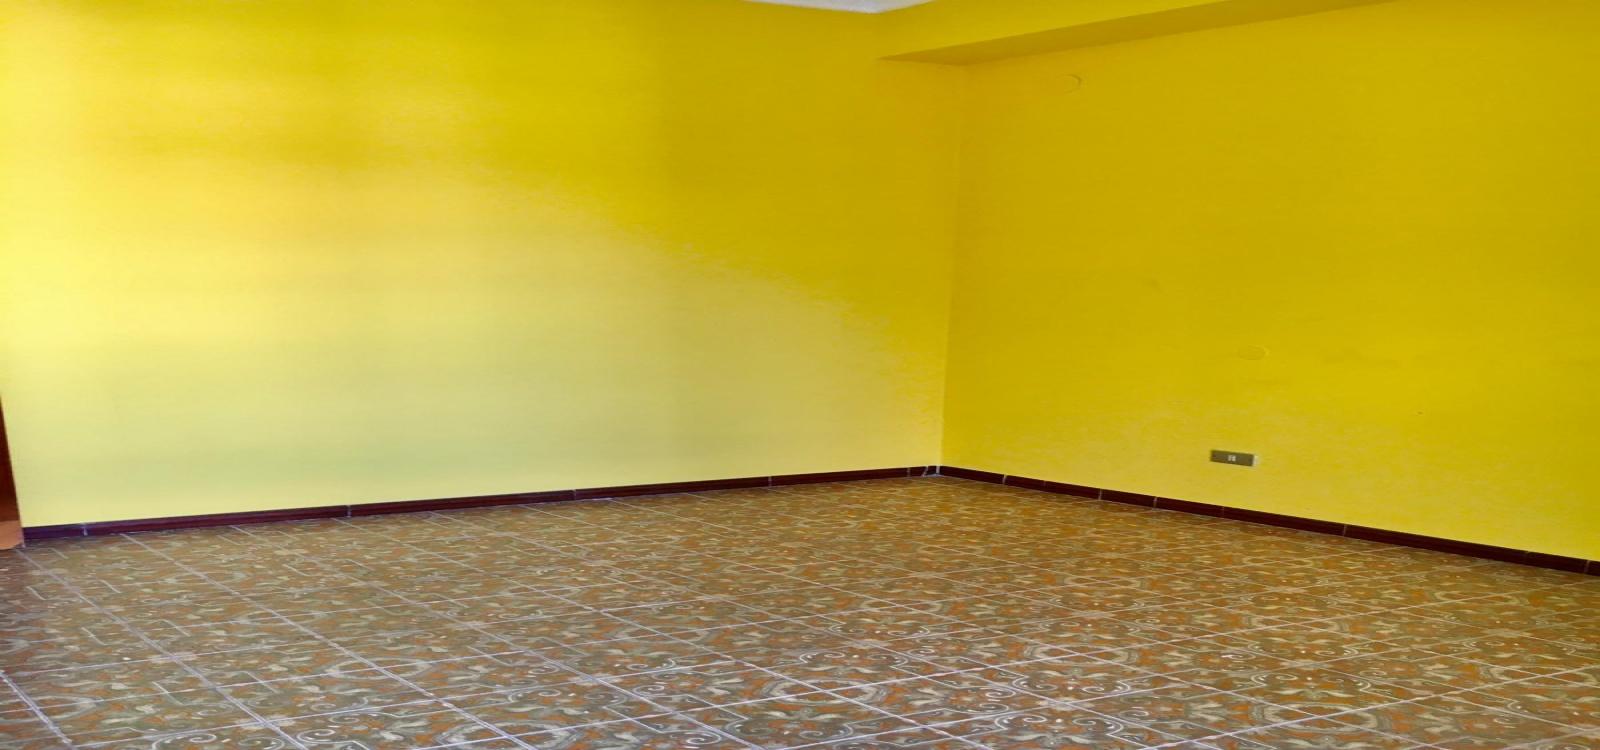 BELVEDERE,BELVEDERE,Appartamento,BELVEDERE,2307